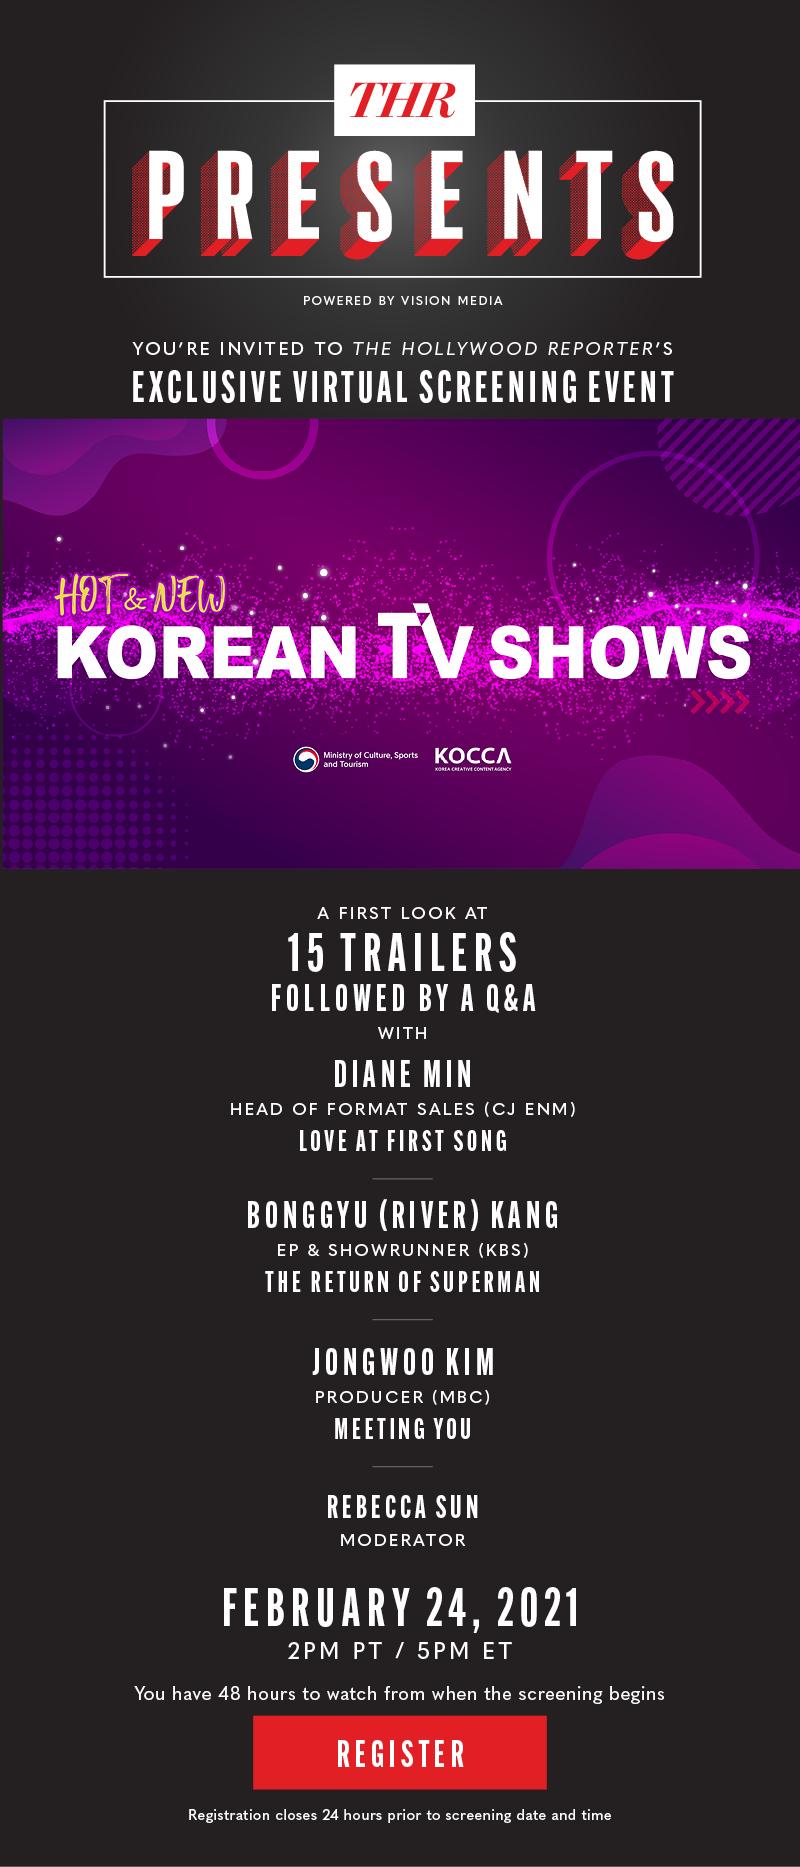 Exclusive Invitation: HOT & NEW KOREAN TV SHOWCASE + Q&A